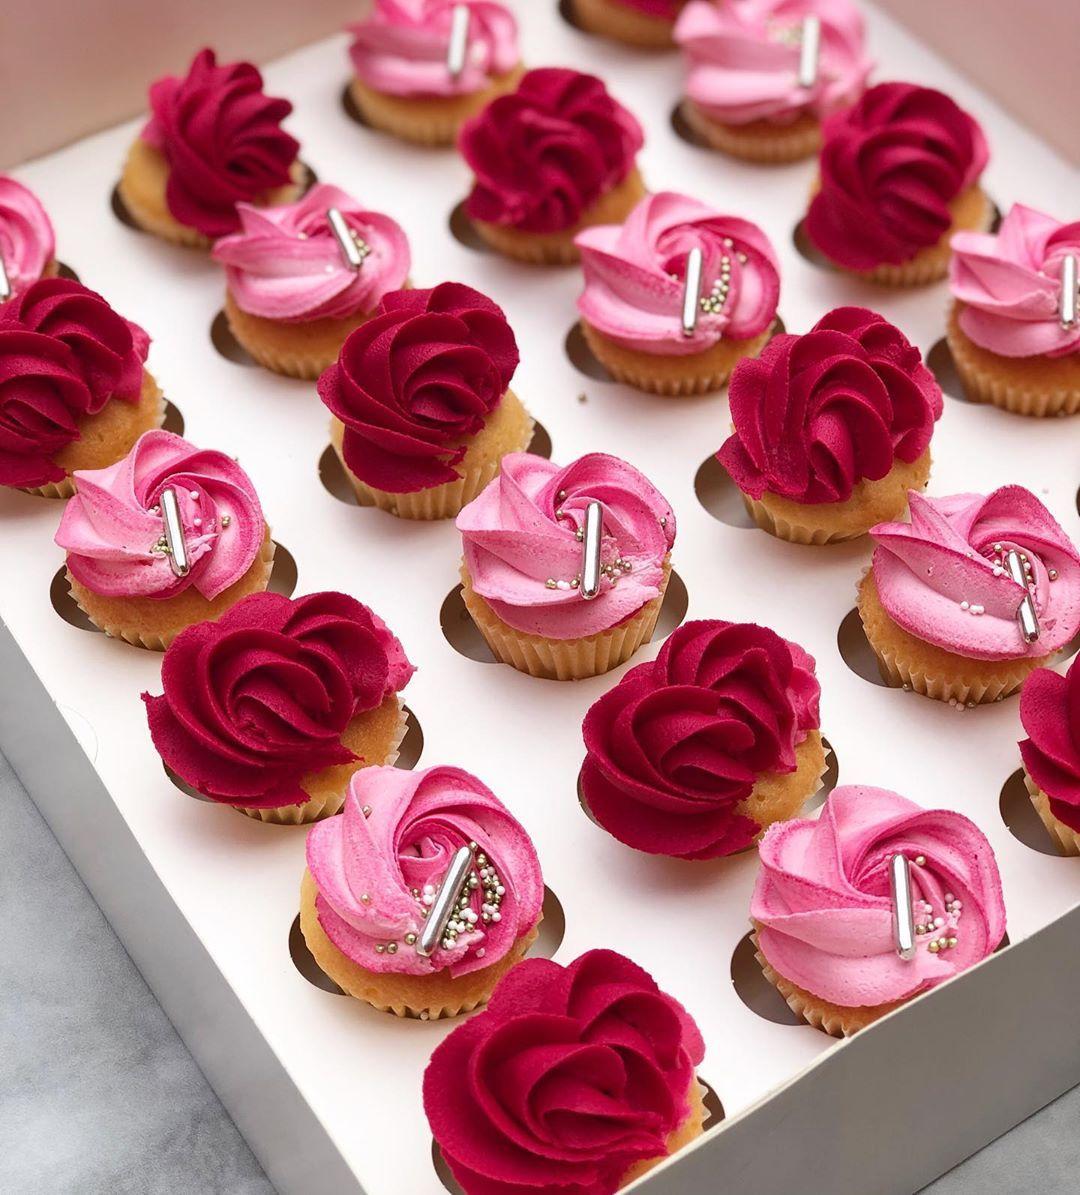 Cool Cute Mini Cupcakes For A Little Princesses Birthday Funny Birthday Cards Online Inifodamsfinfo